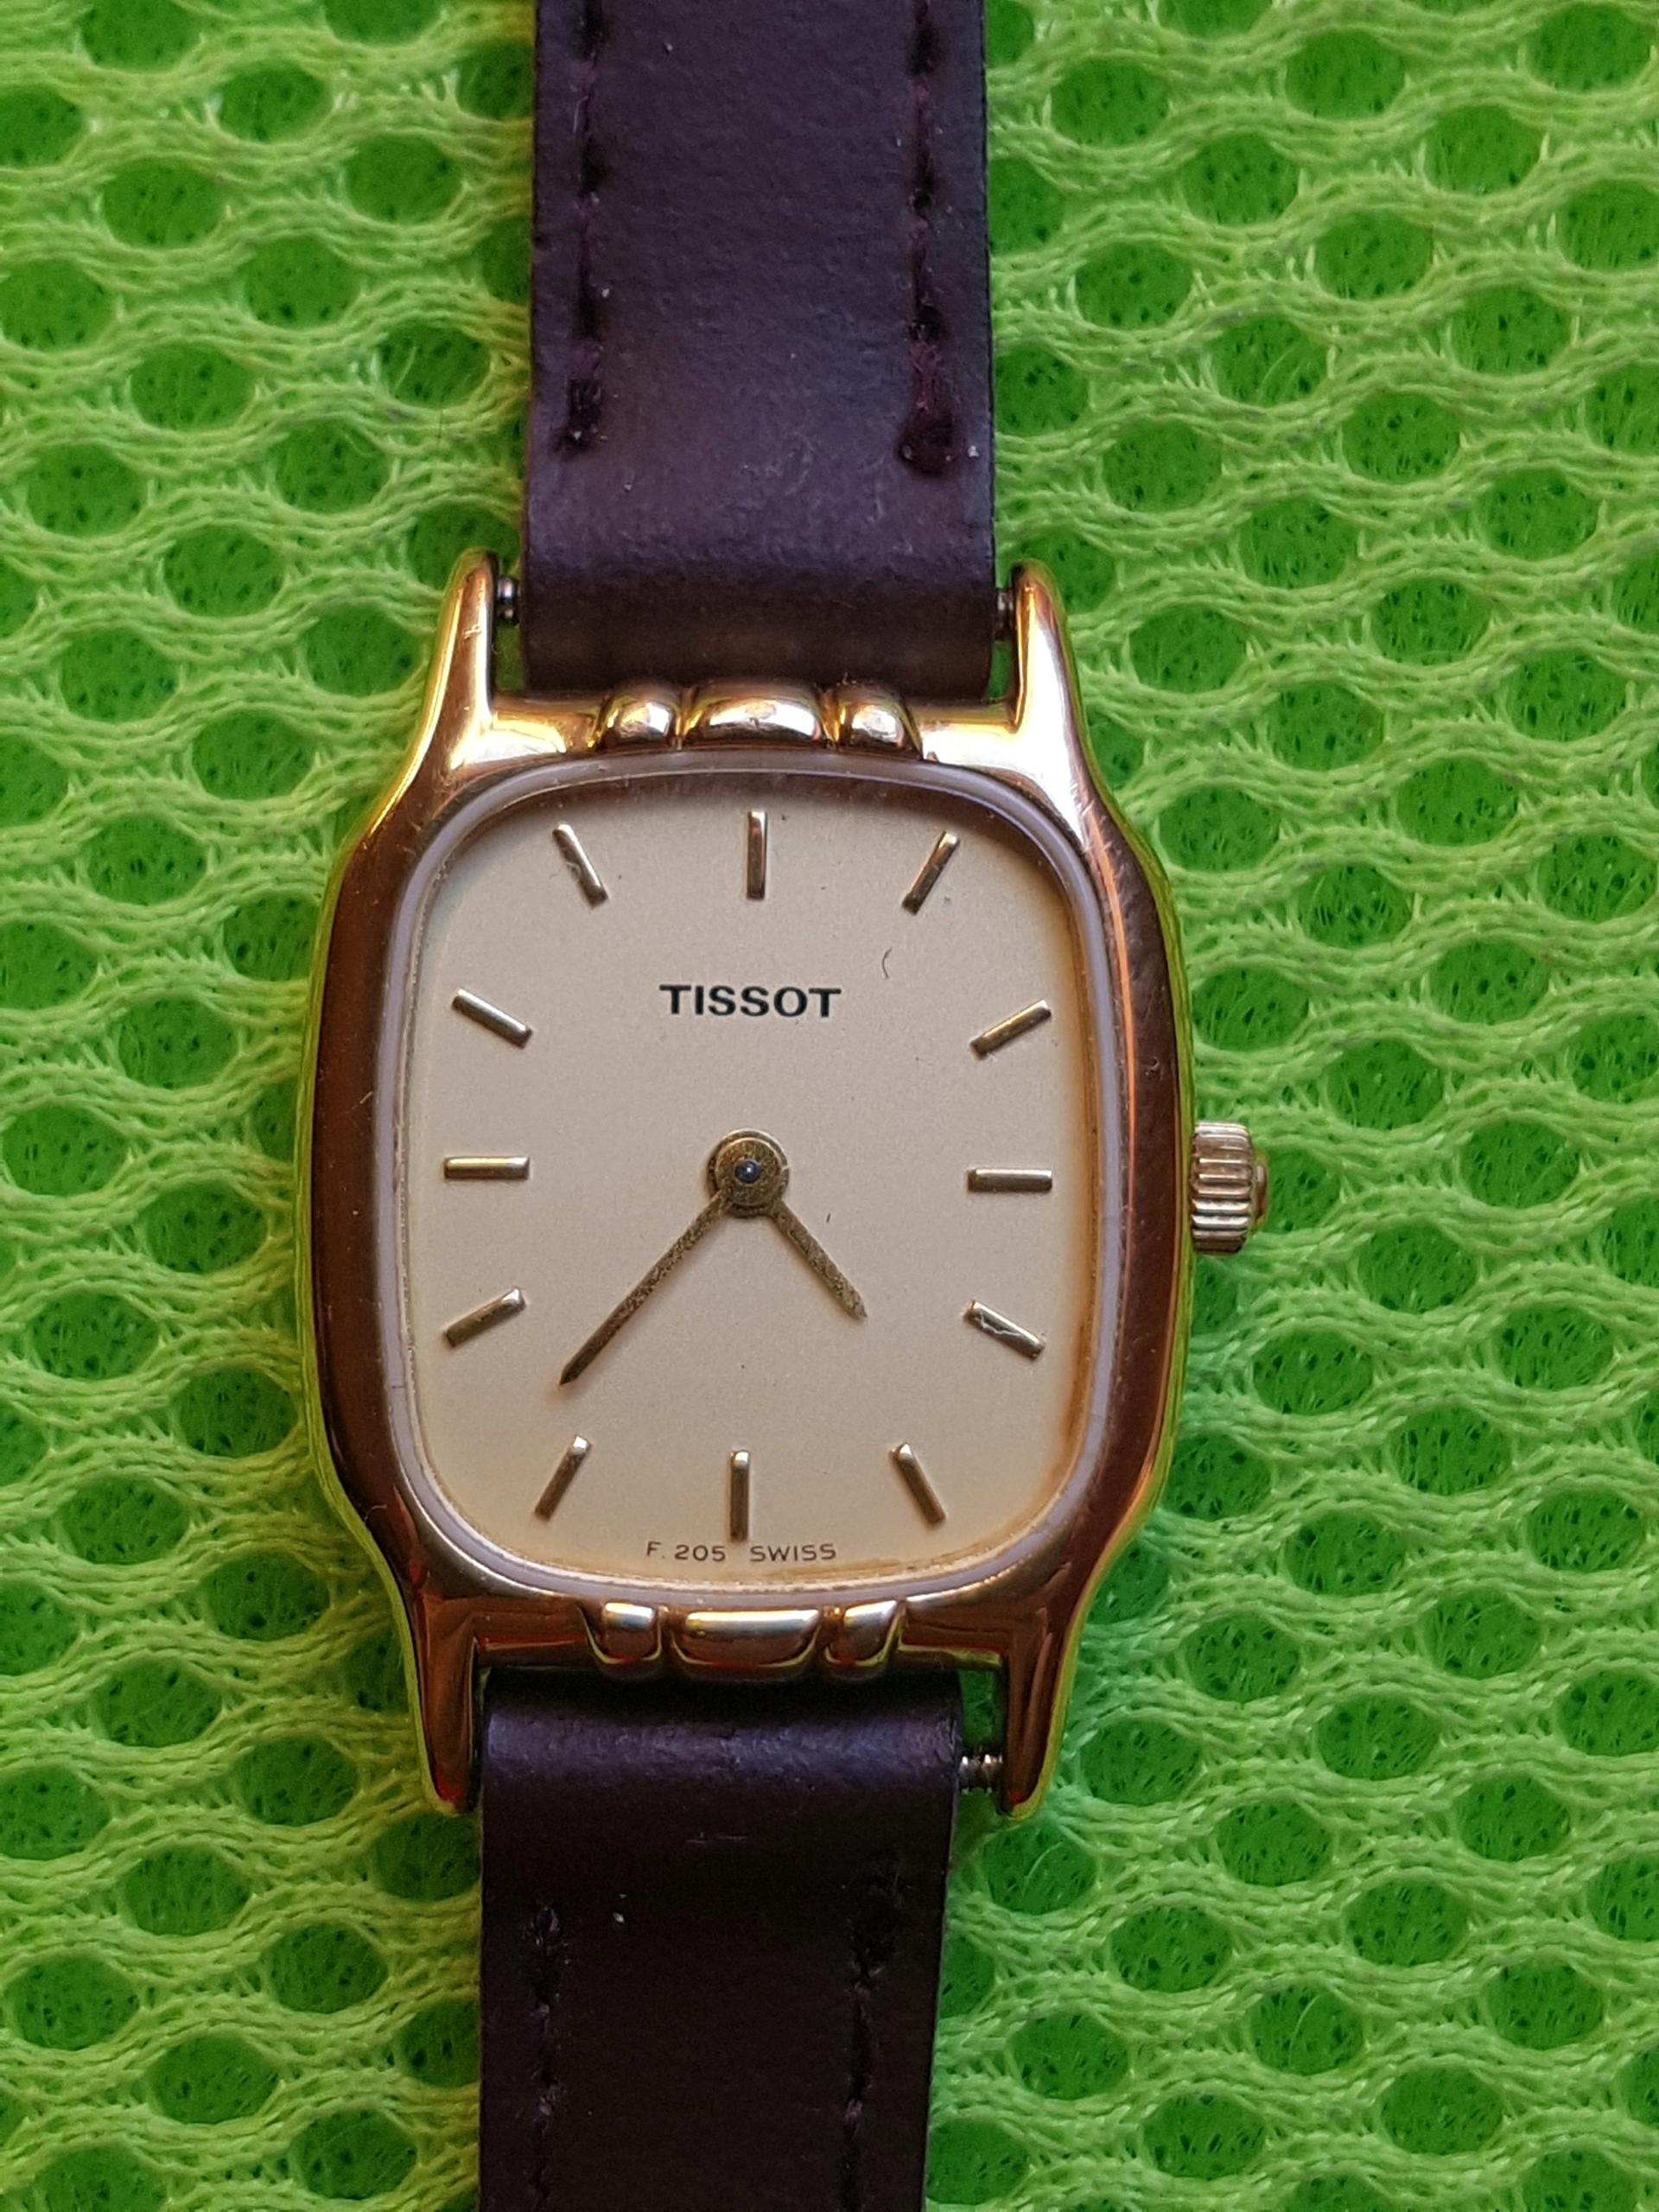 Szwajcarski damski zegarek Tissot F 205